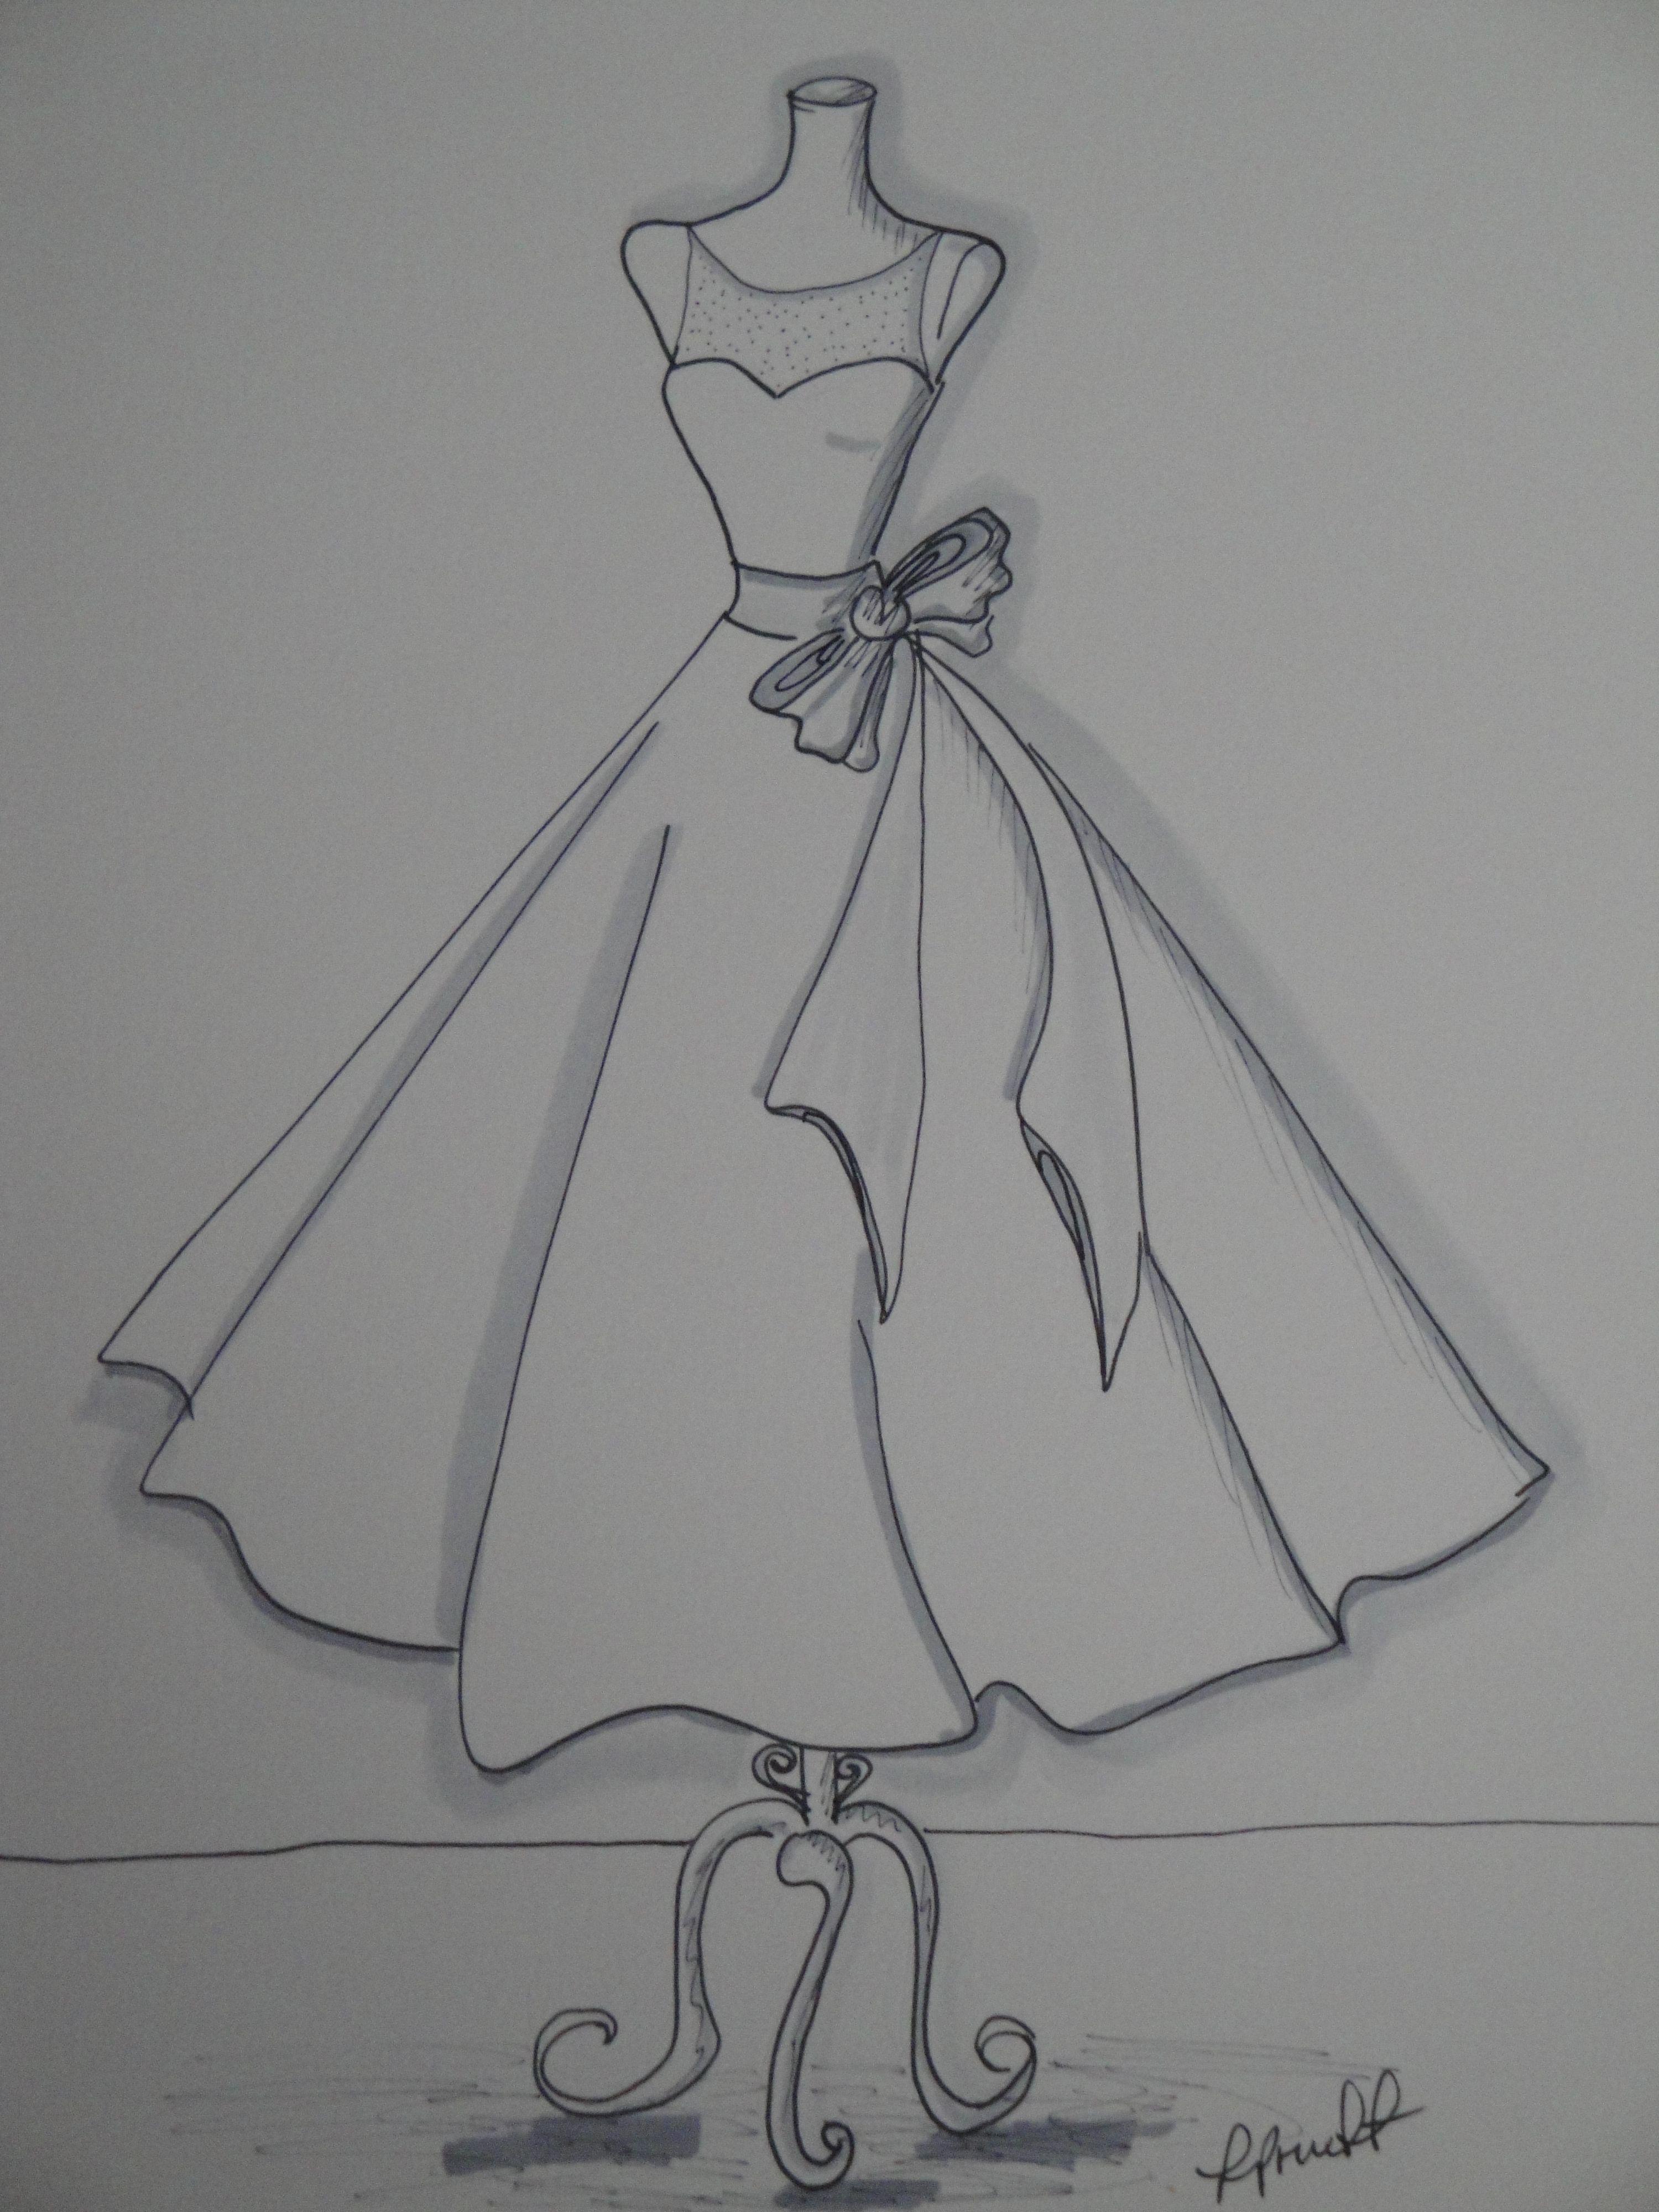 Custom wedding dress sketch by laura pruett of laura arts and design